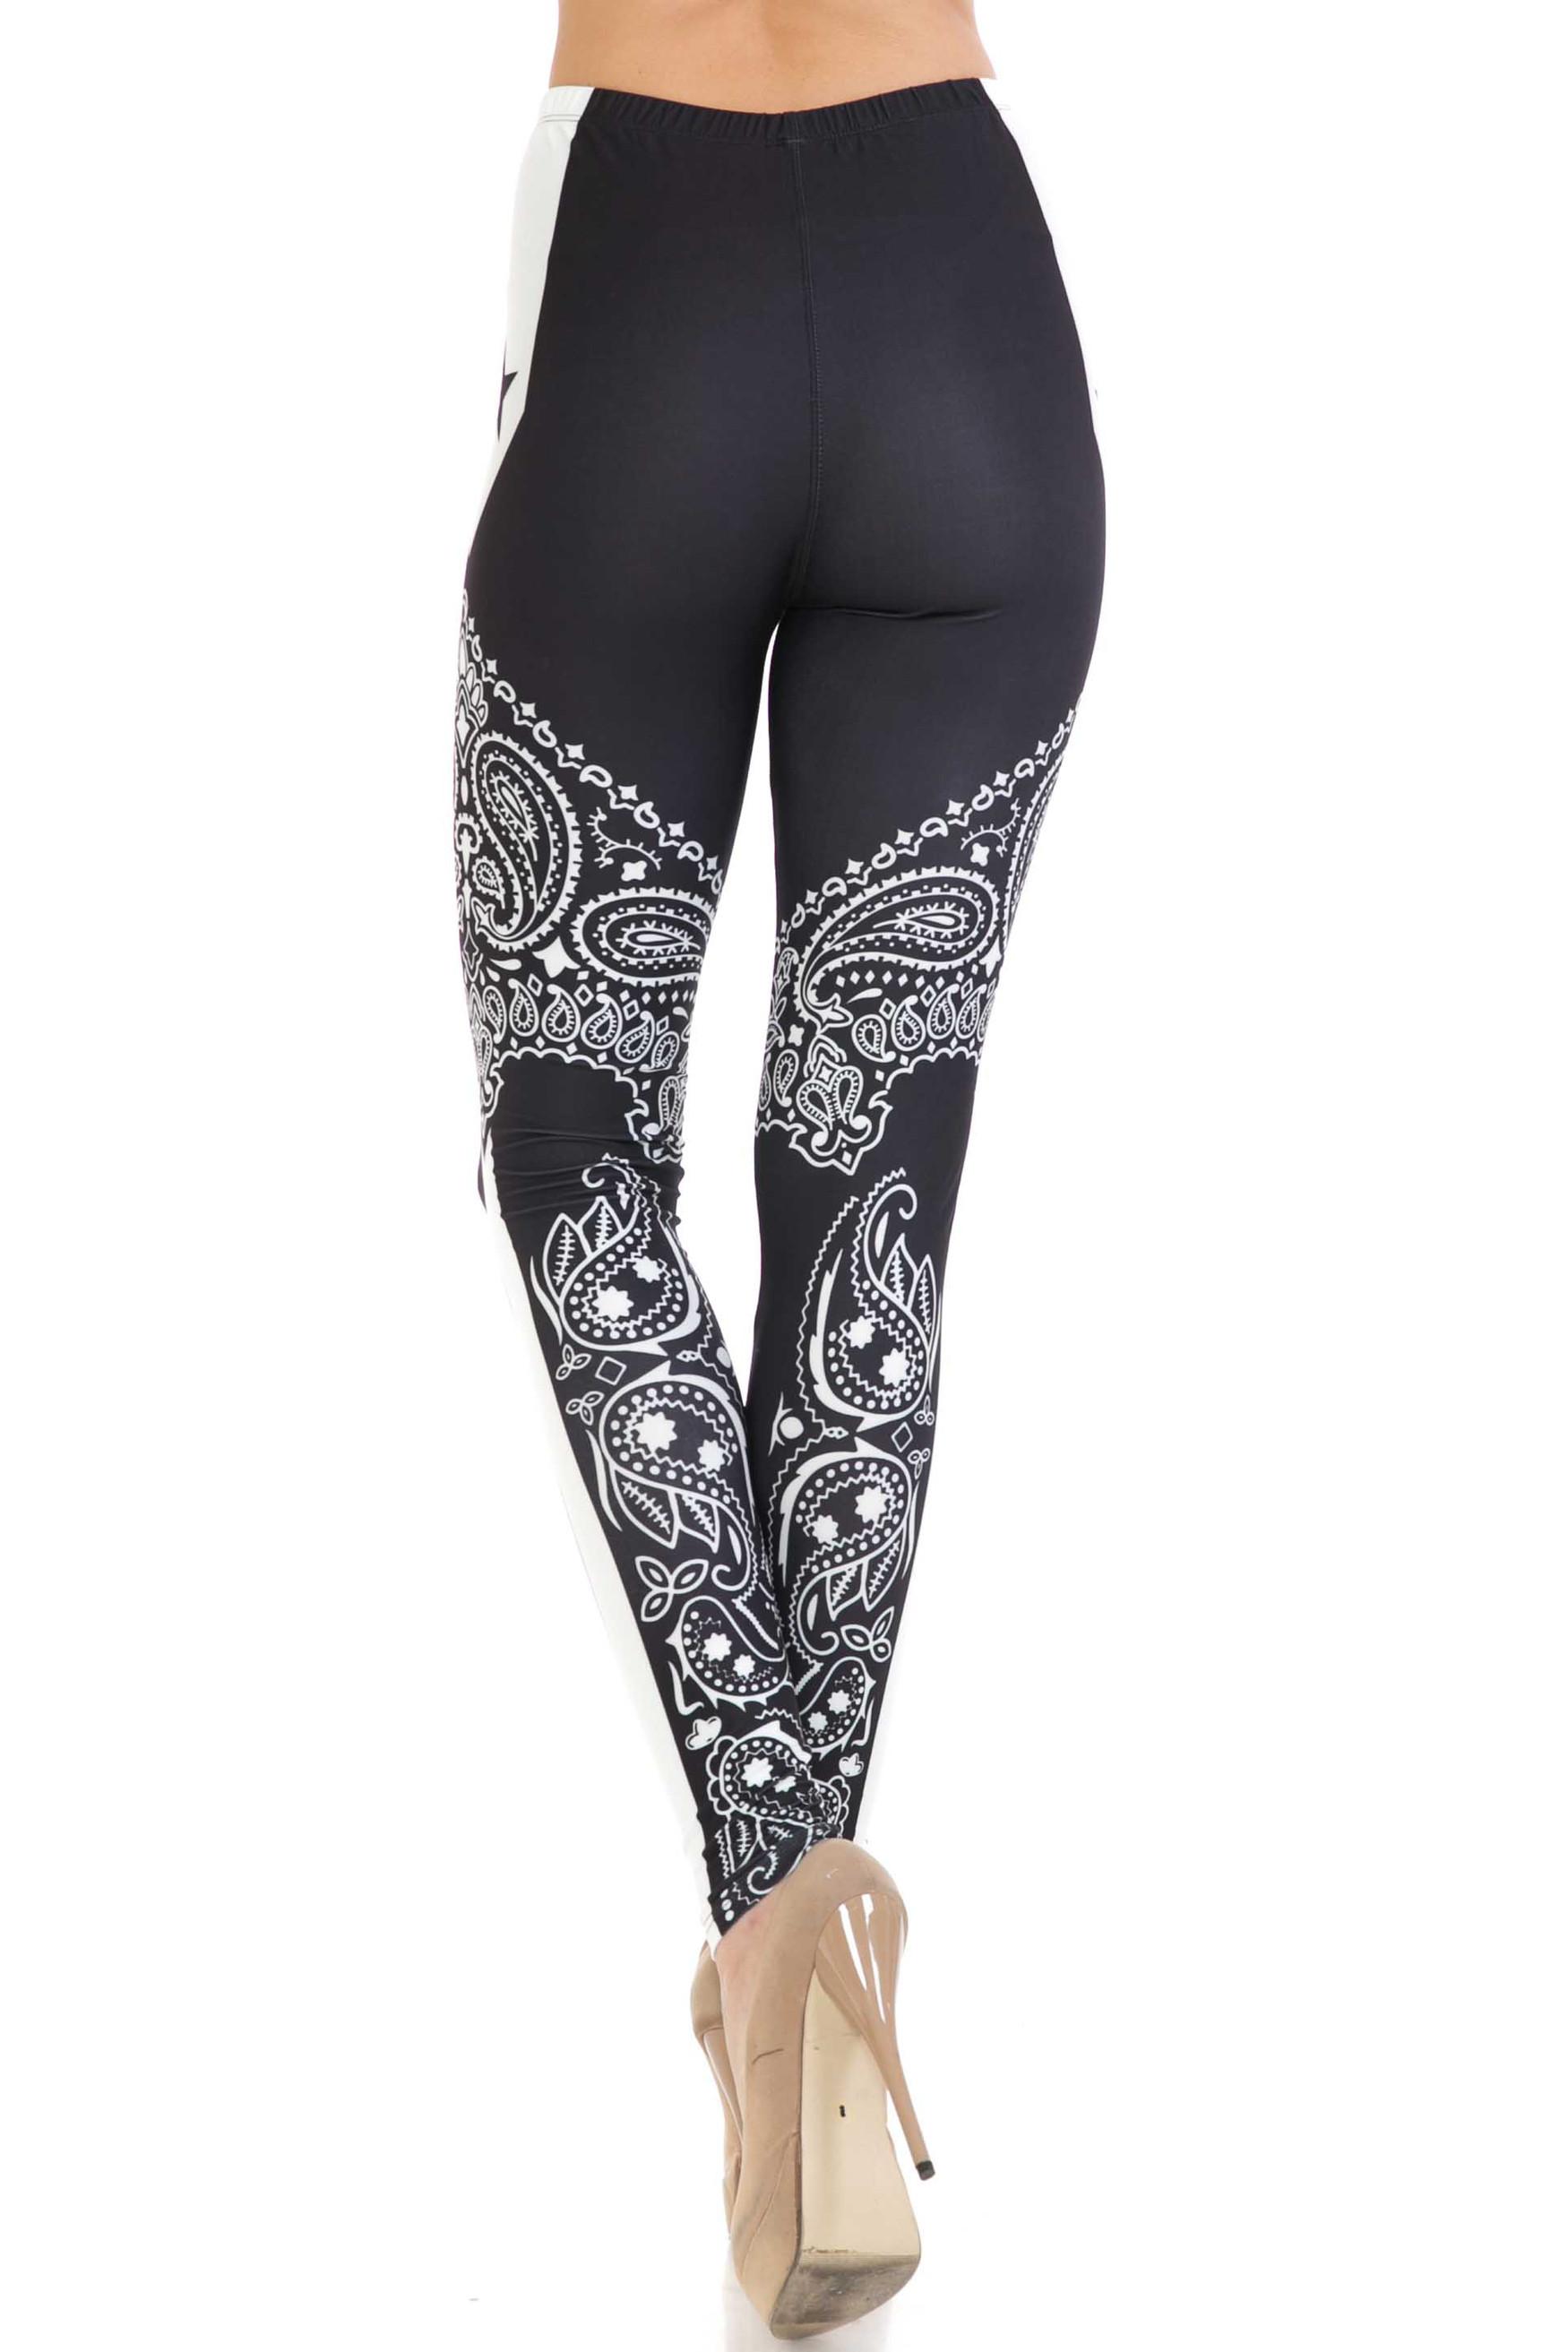 Creamy Soft Bandana Stars Extra Plus Size Leggings - 3X-5X - USA Fashion™